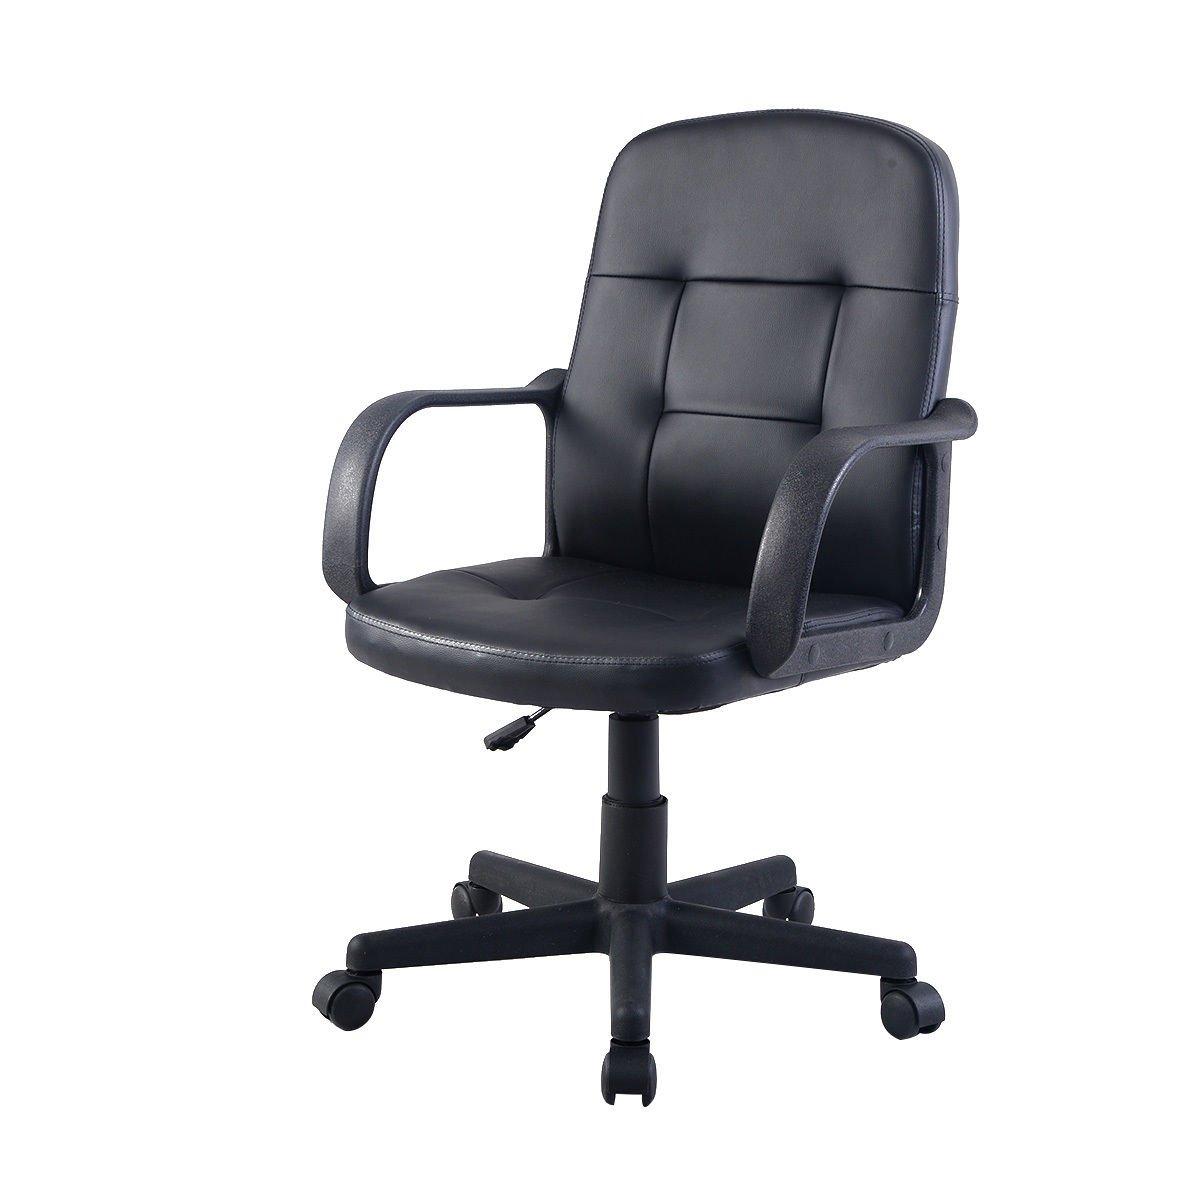 Fantastic Super Buy New Pu Leather Ergonomic Midback Executive Computer Desk Task Office Chair Black Ibusinesslaw Wood Chair Design Ideas Ibusinesslaworg